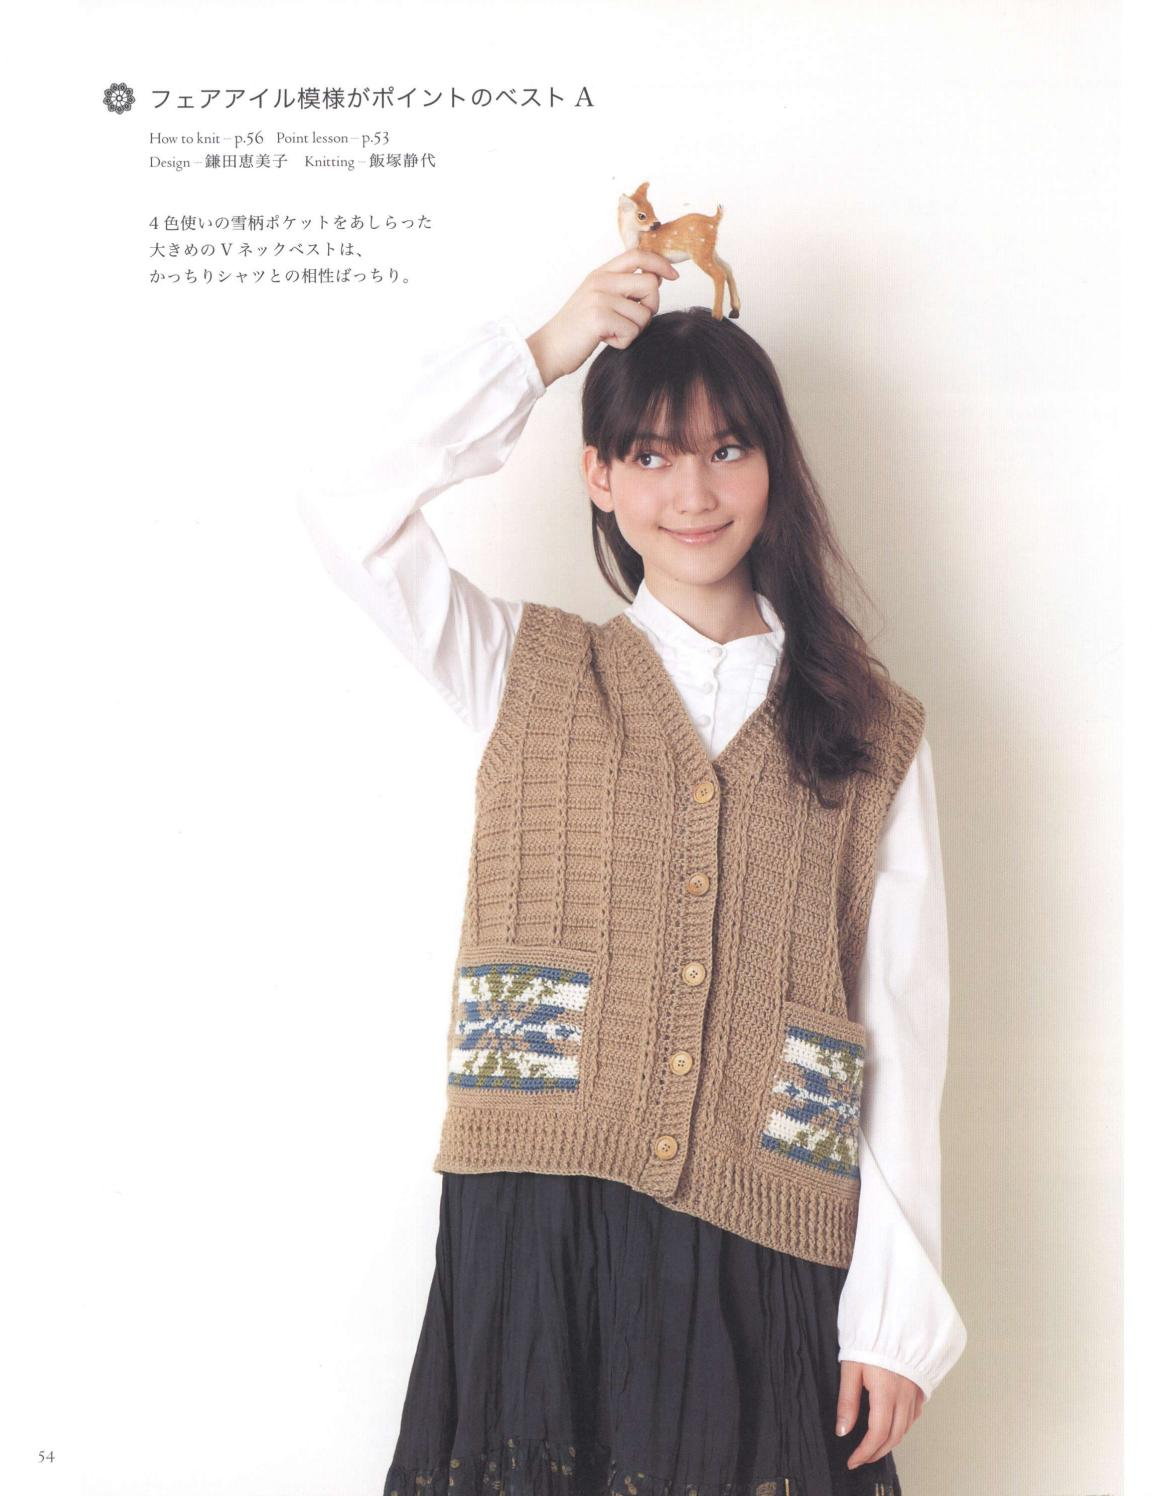 Asahi original crochet best selection 2012 page 54